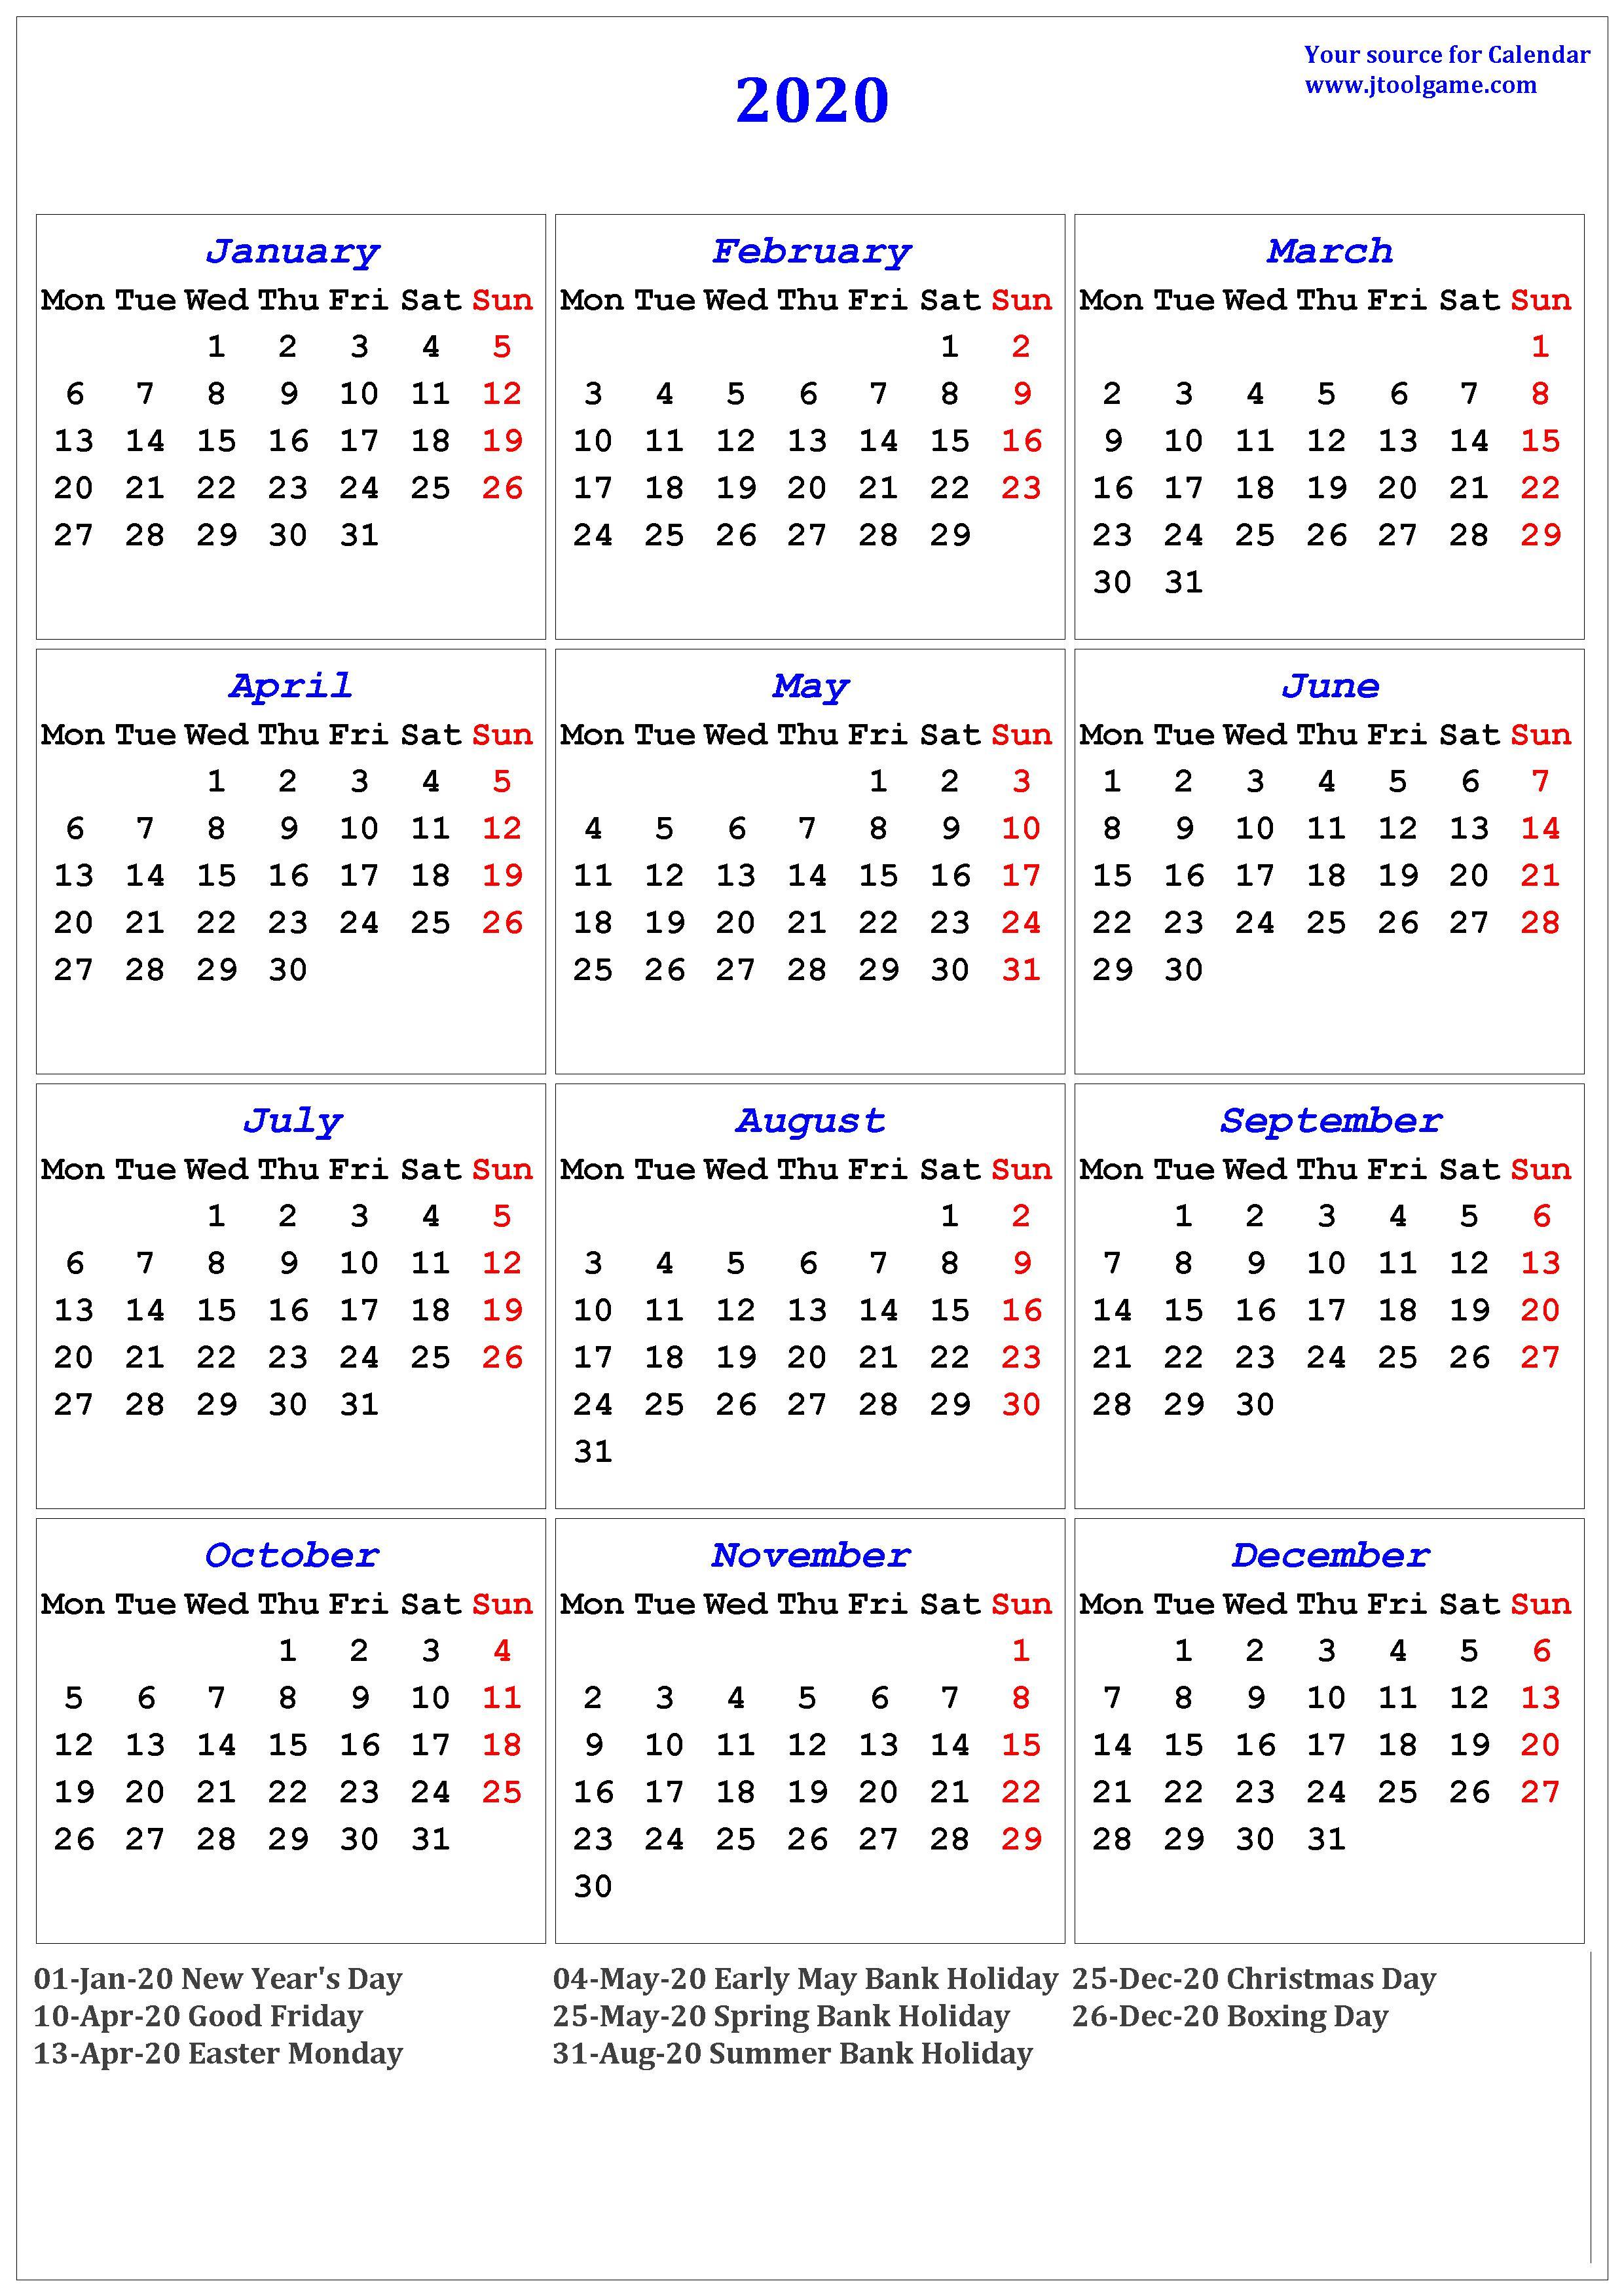 2020 Holiday Calendar Us